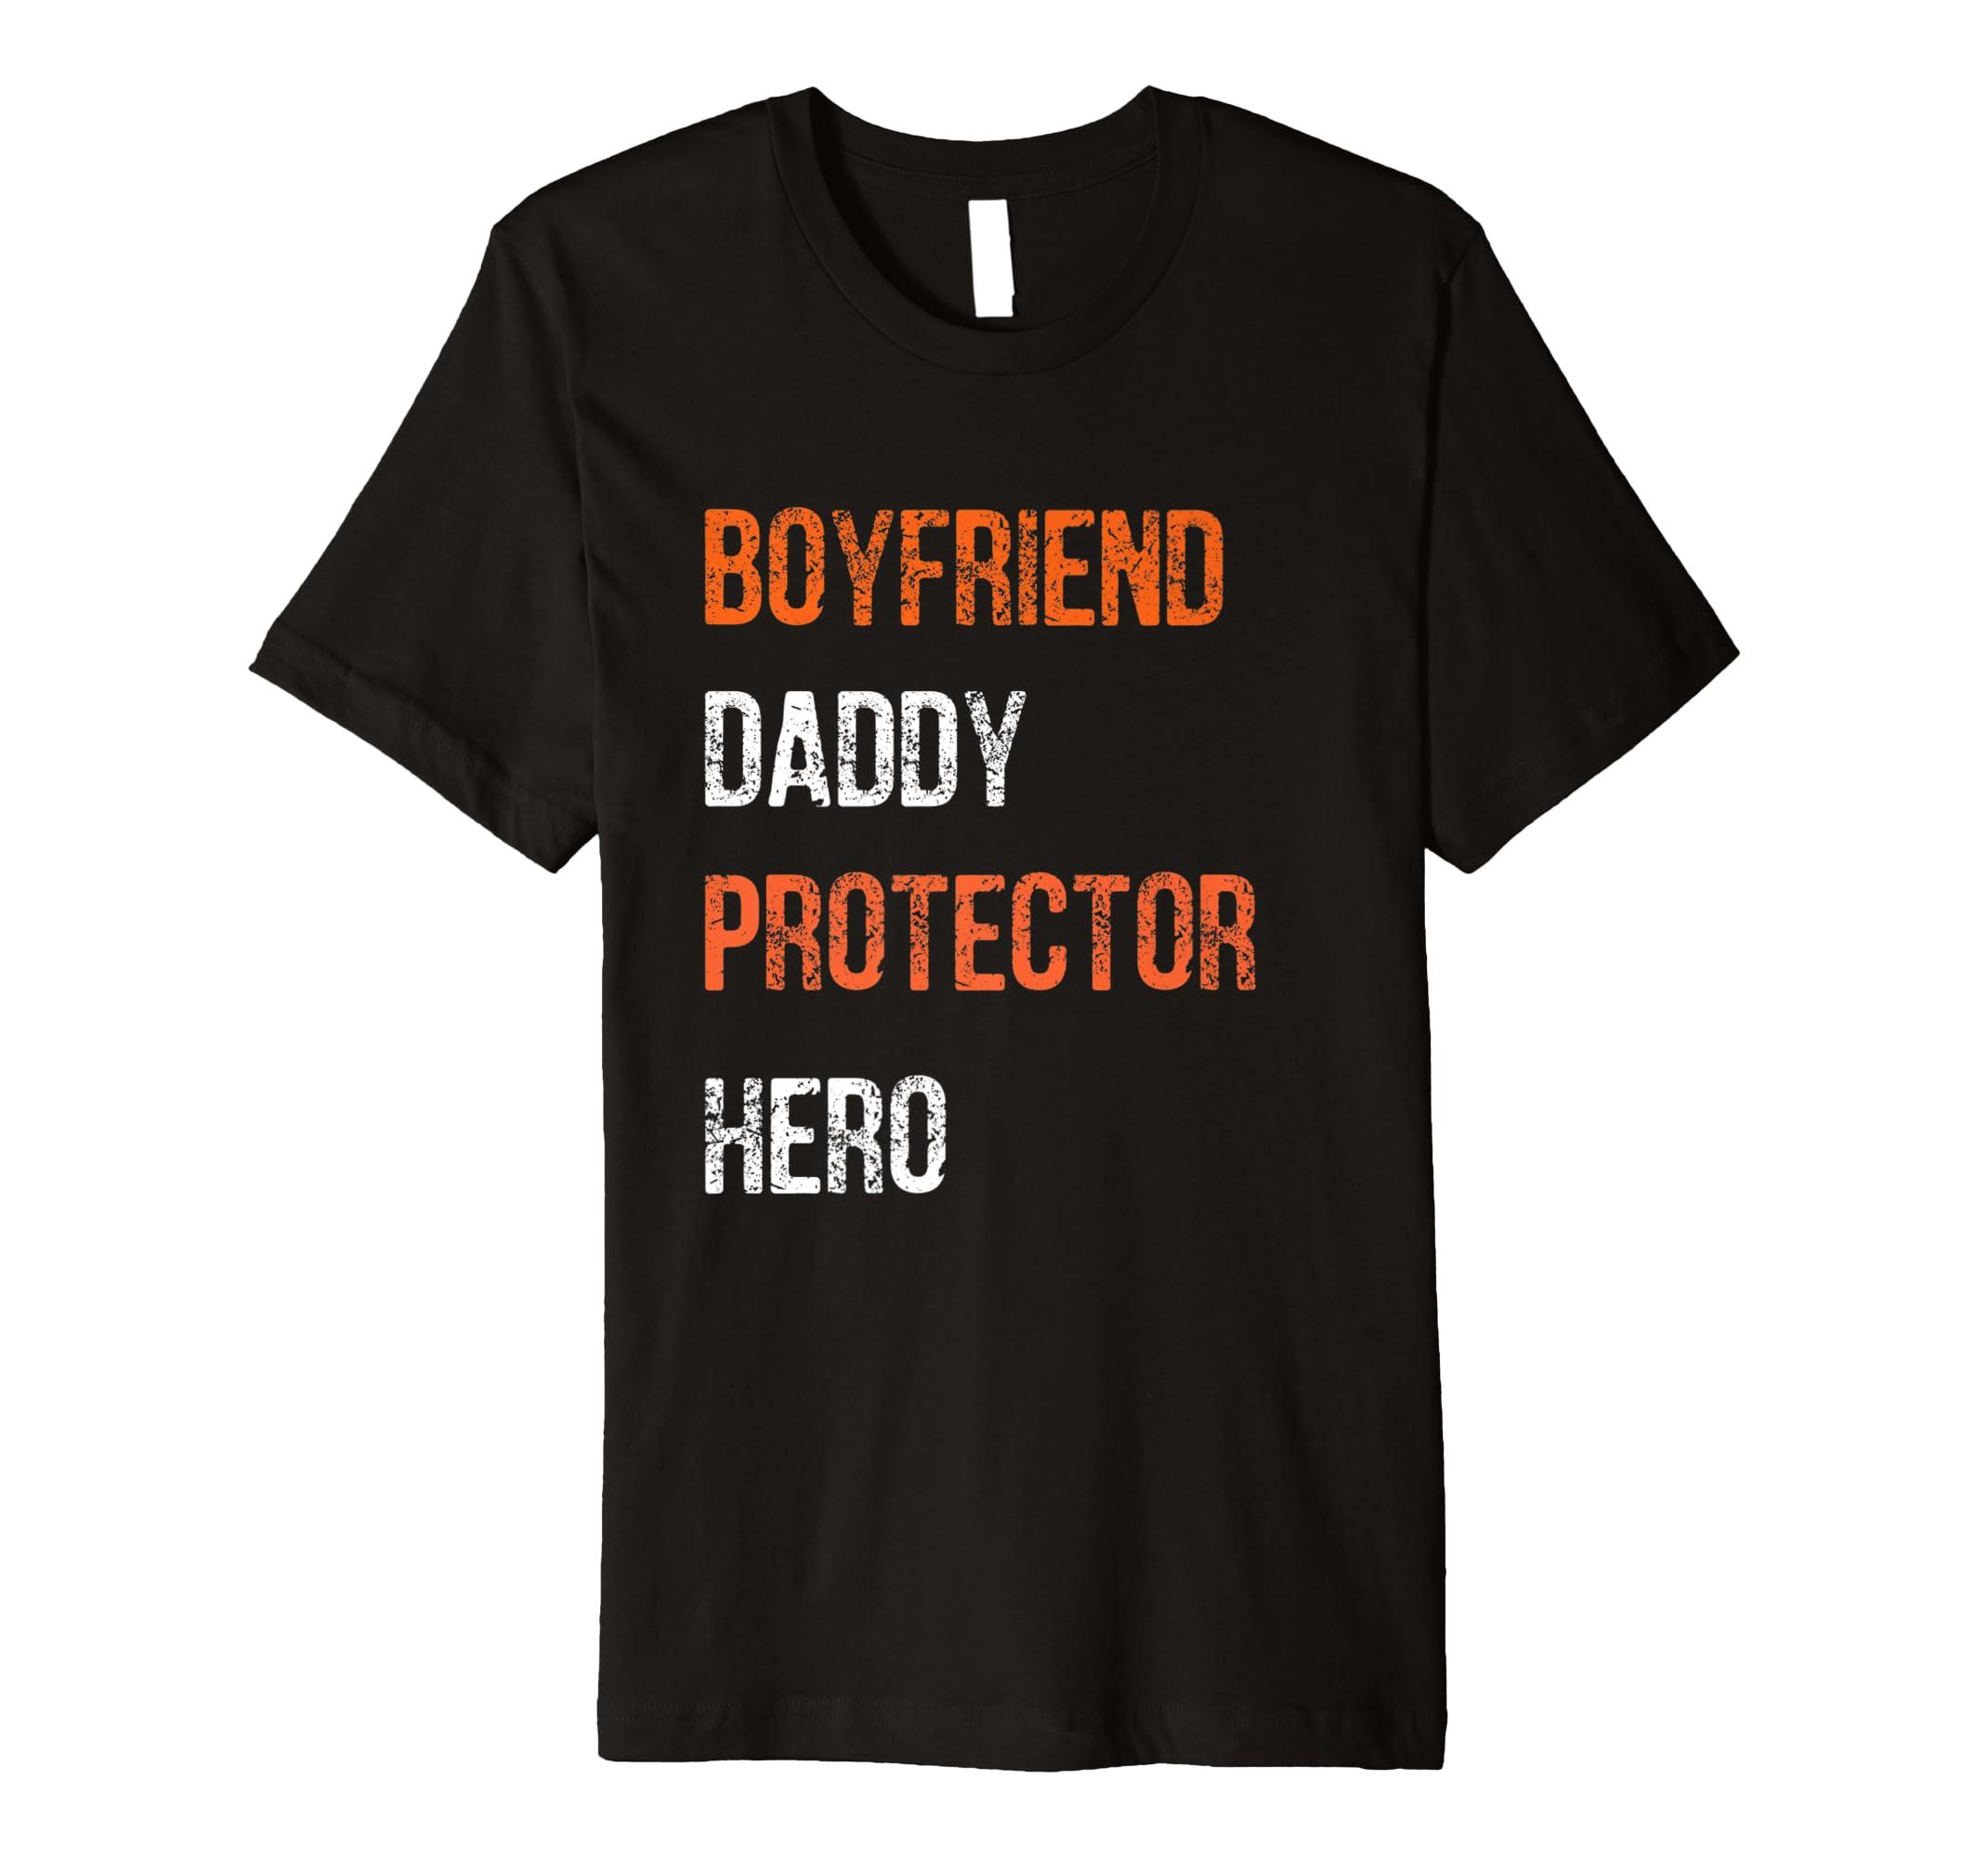 7302cb94 Mens Fathers Day Gift Boyfriend Daddy Hero Shirt from Girlfriend- TPT